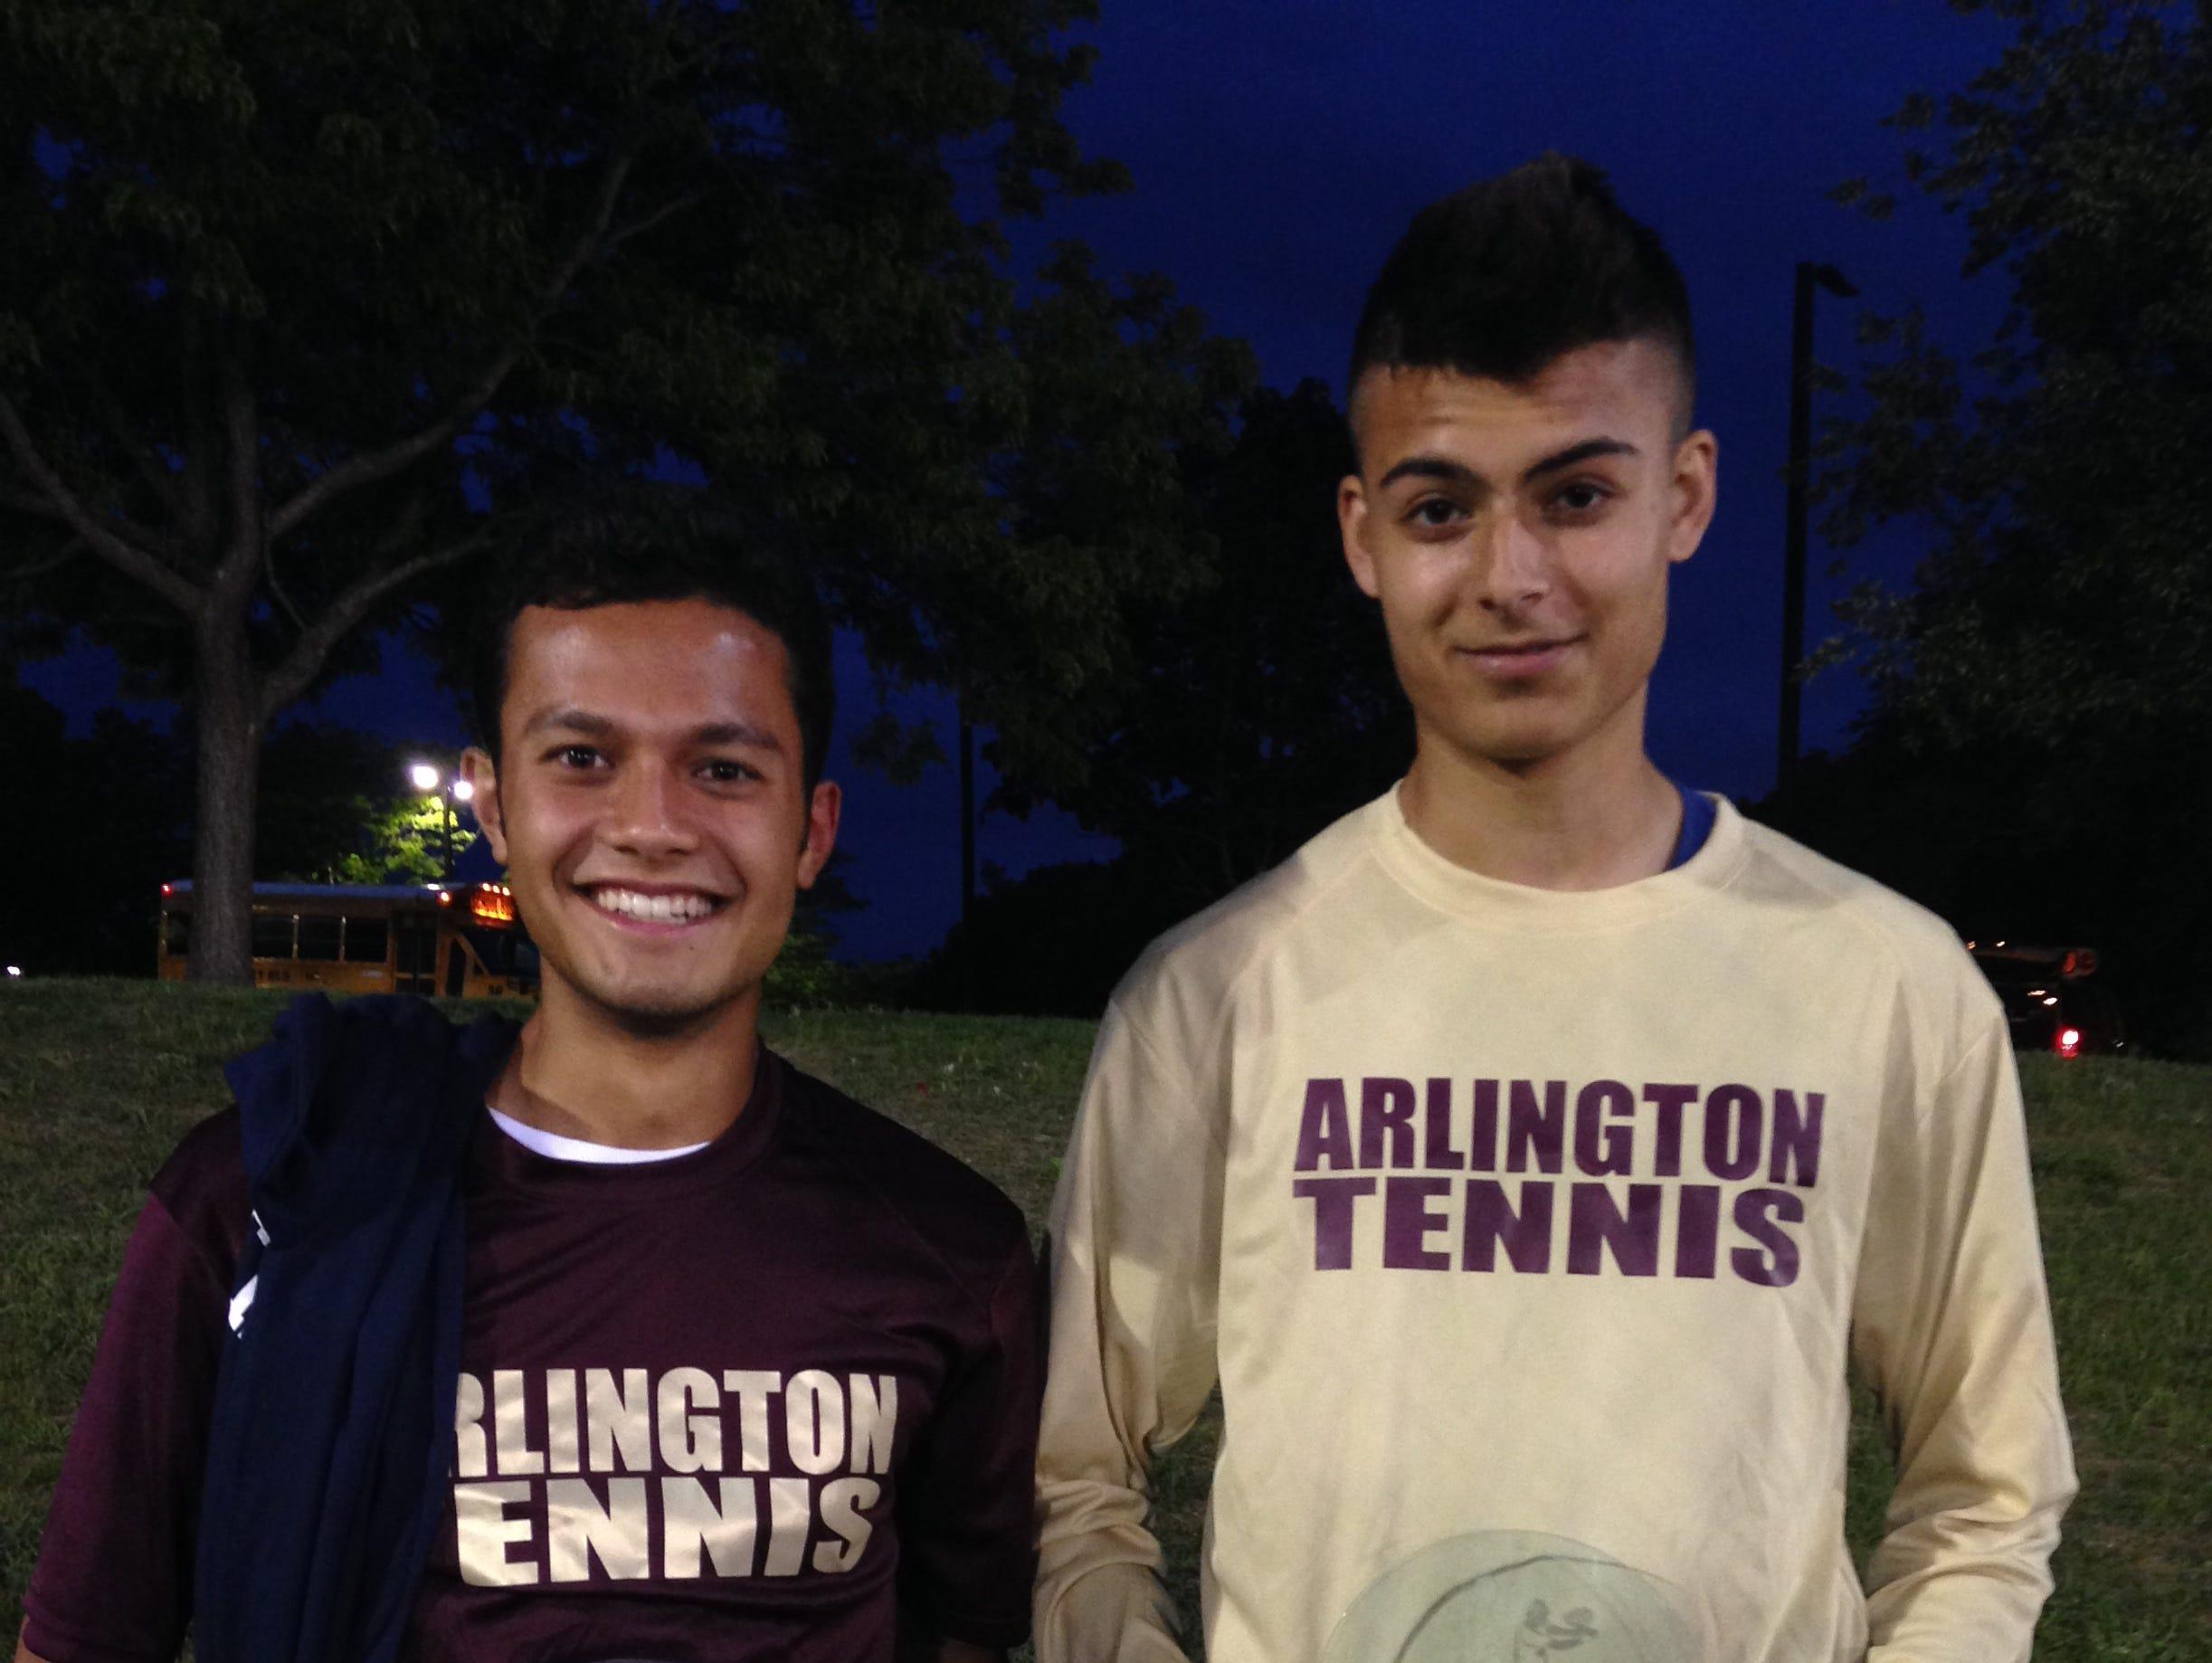 Arlington's Mark Cukaj and Sean Gorwara qualified for the state tournament.